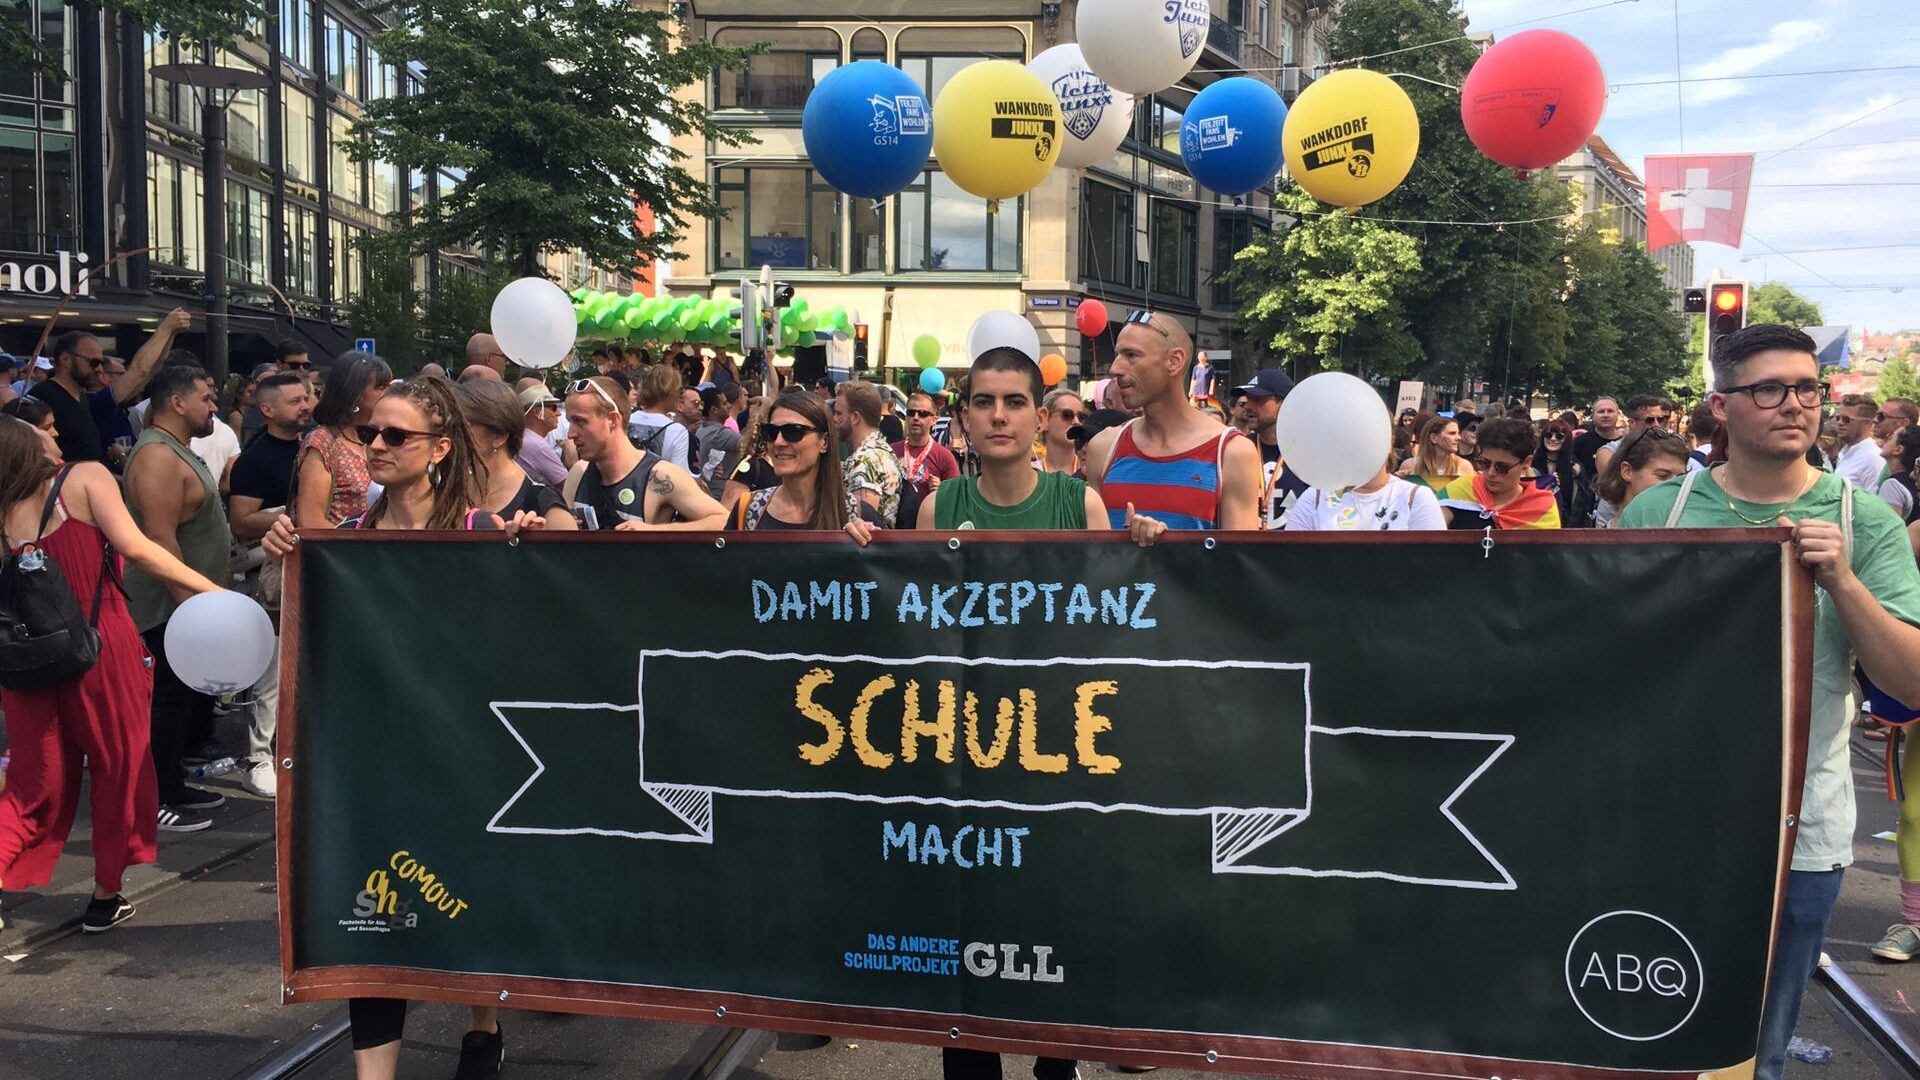 COMOUT-Schulprojekt an der Züri Pride 2019